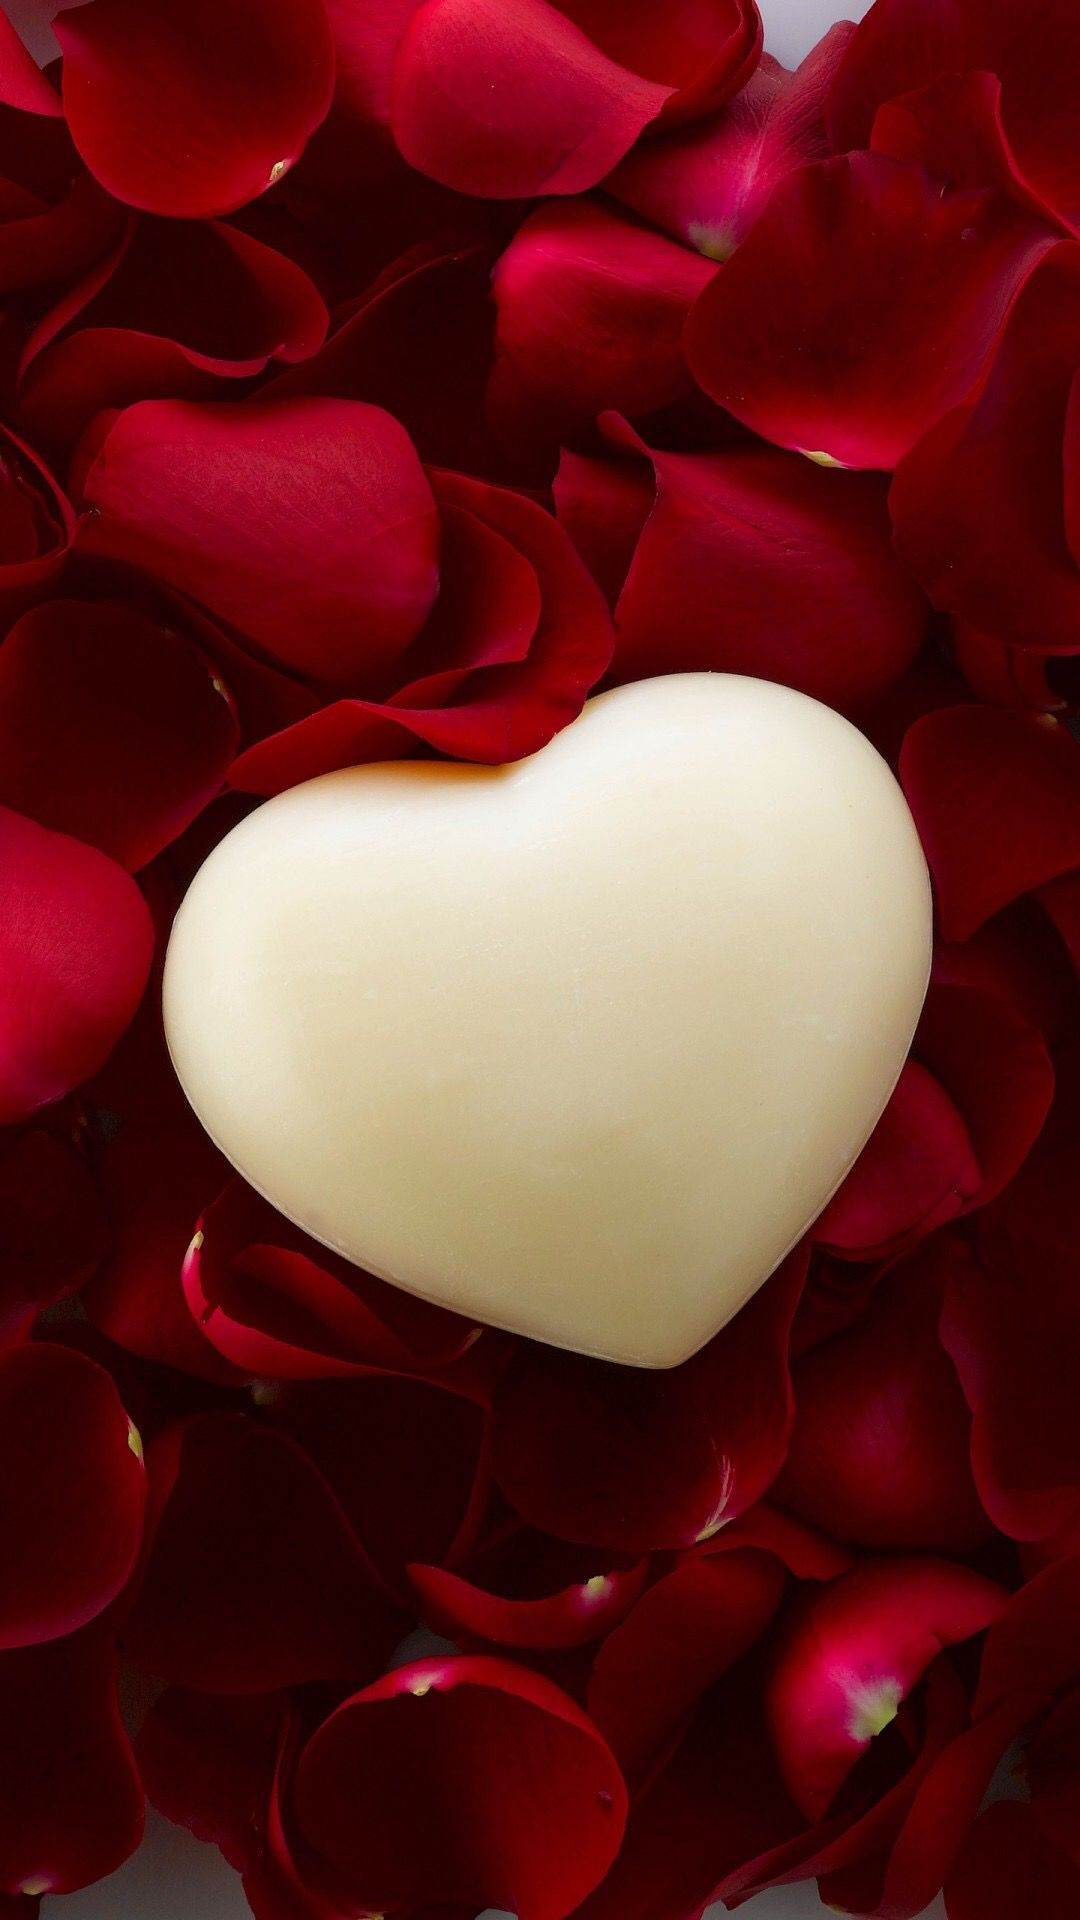 White heart rose petals art heart art pinterest - Pink roses and hearts wallpaper ...